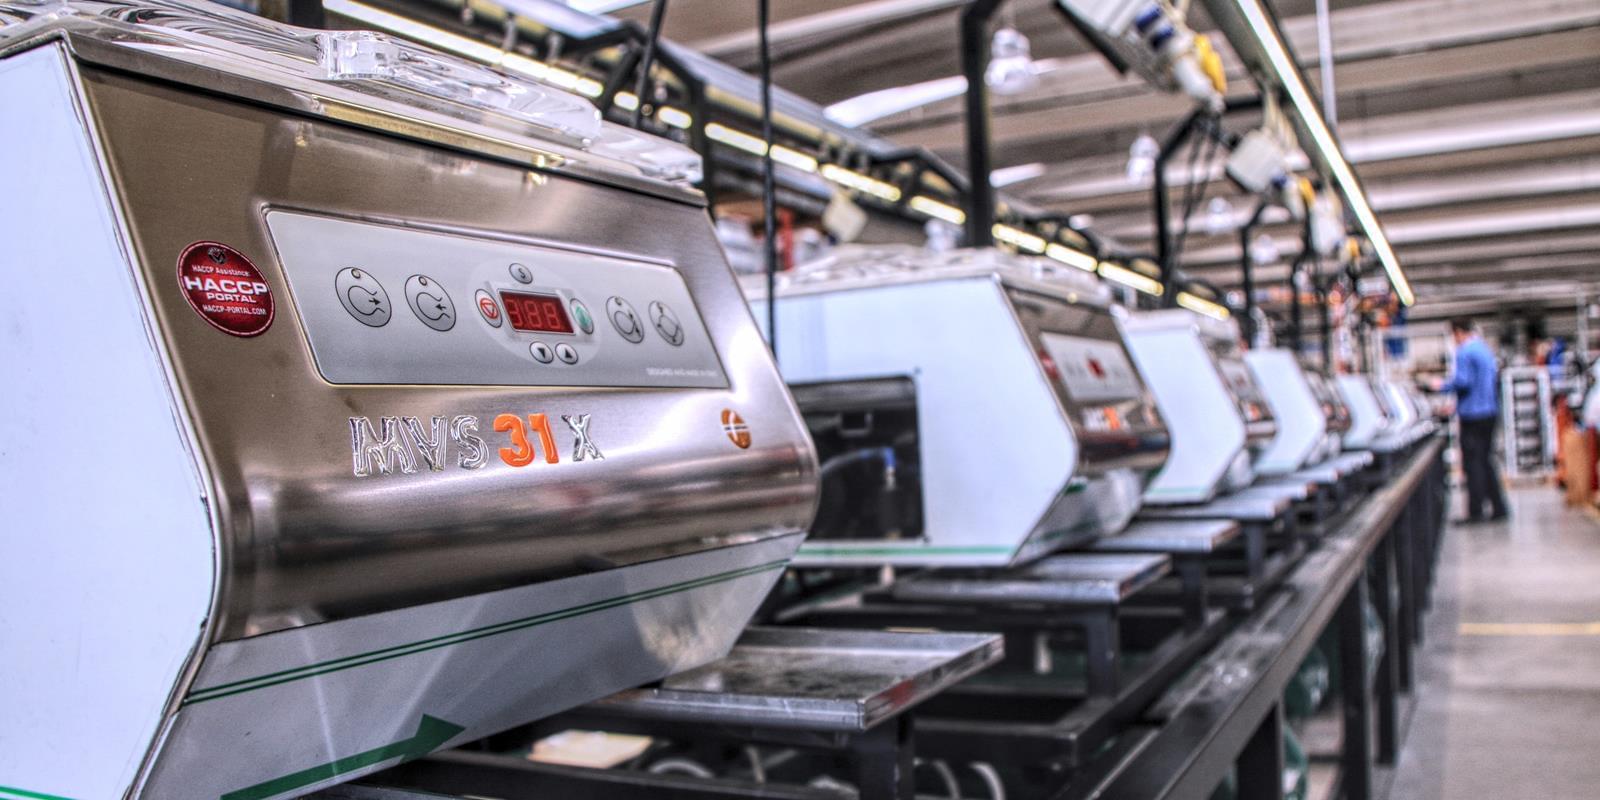 Línea máquinas al vacío cabezal 1600